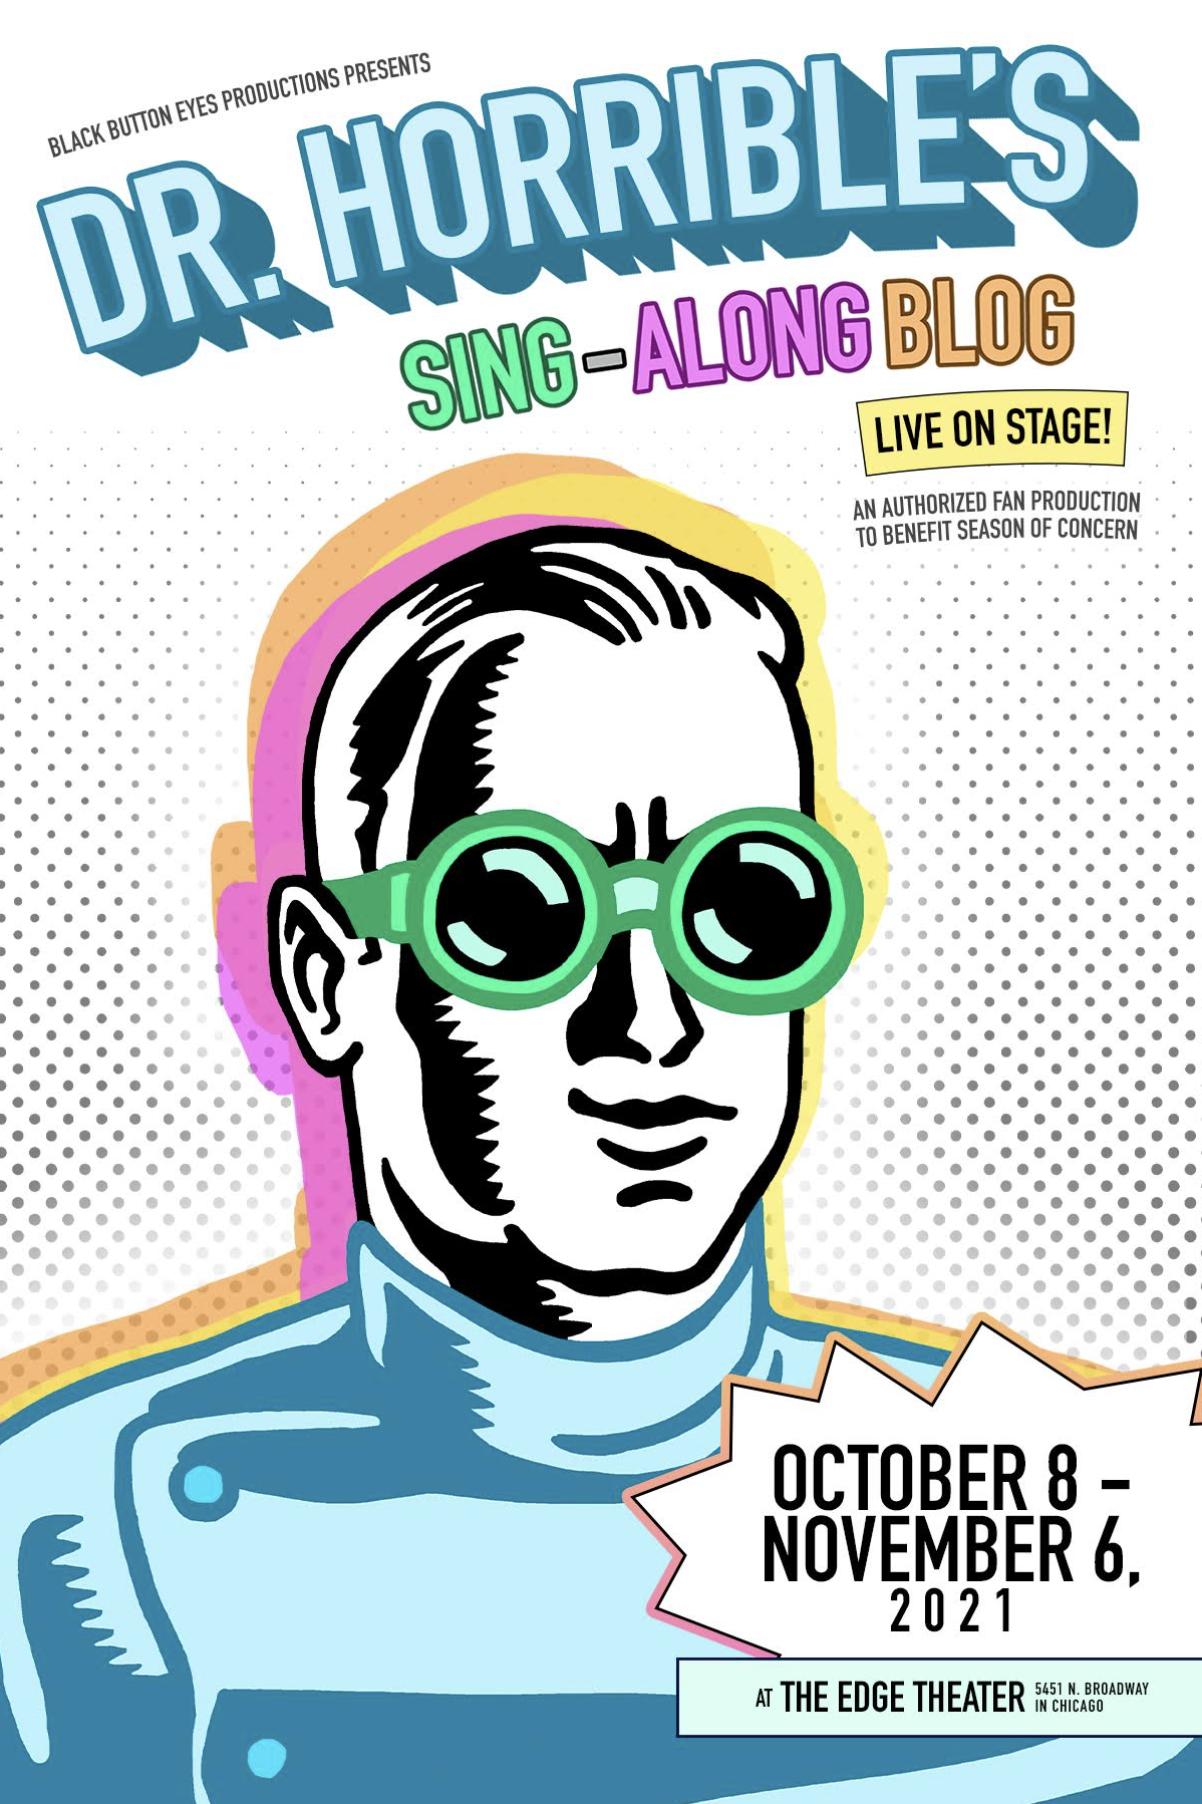 Black Button Eyes Presents Dr. Horrible's Sing-A-Long Blog